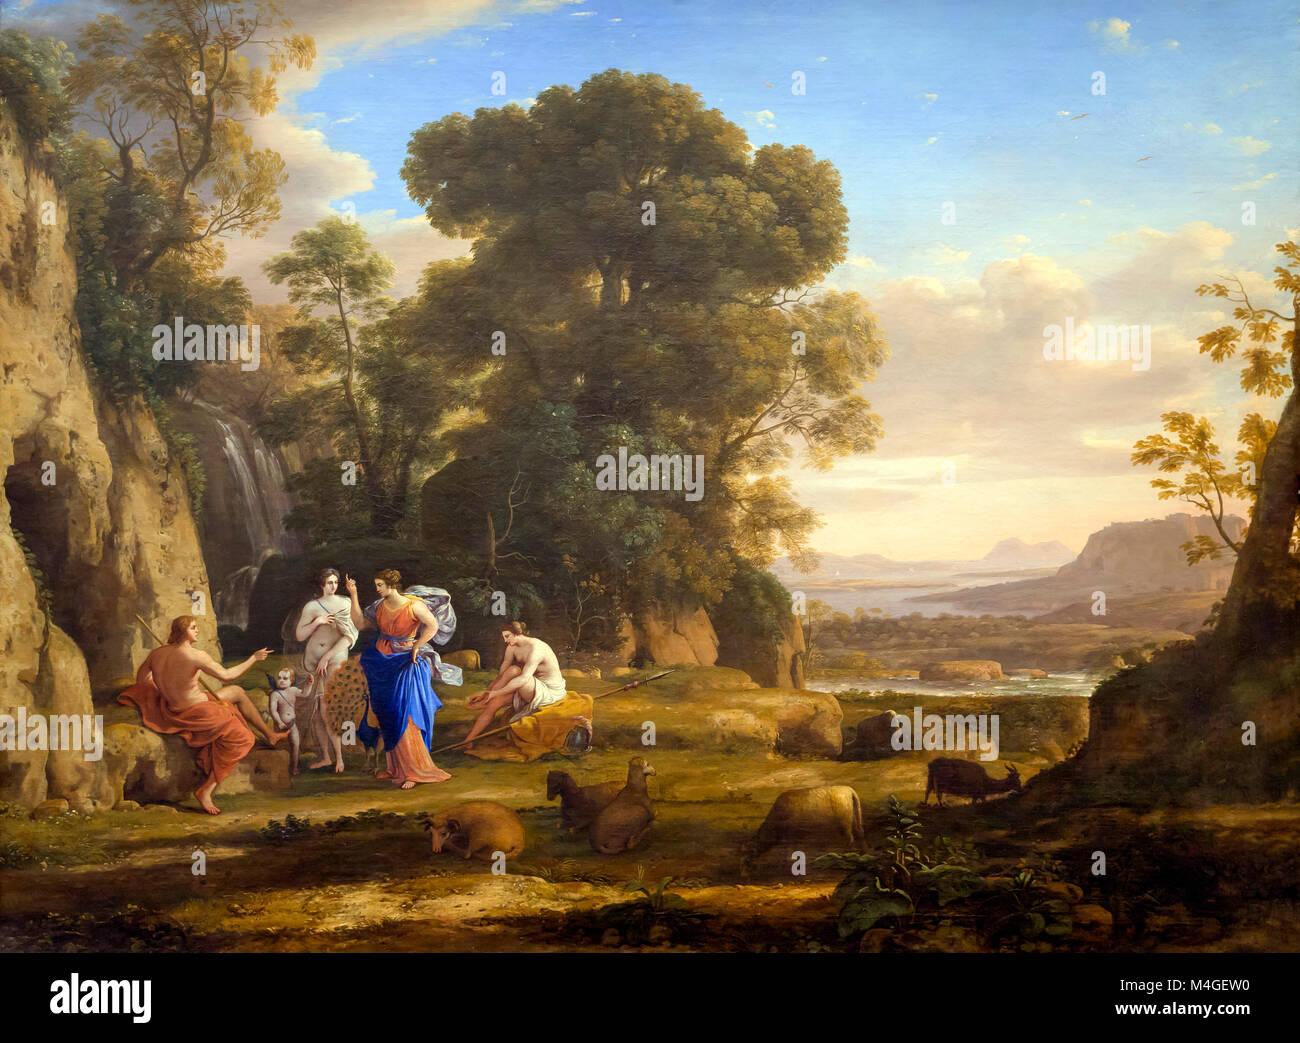 The Judgement of Paris, Claude Lorrain, 1645-1646, National Gallery of Art, Washington DC, USA, North America - Stock Image